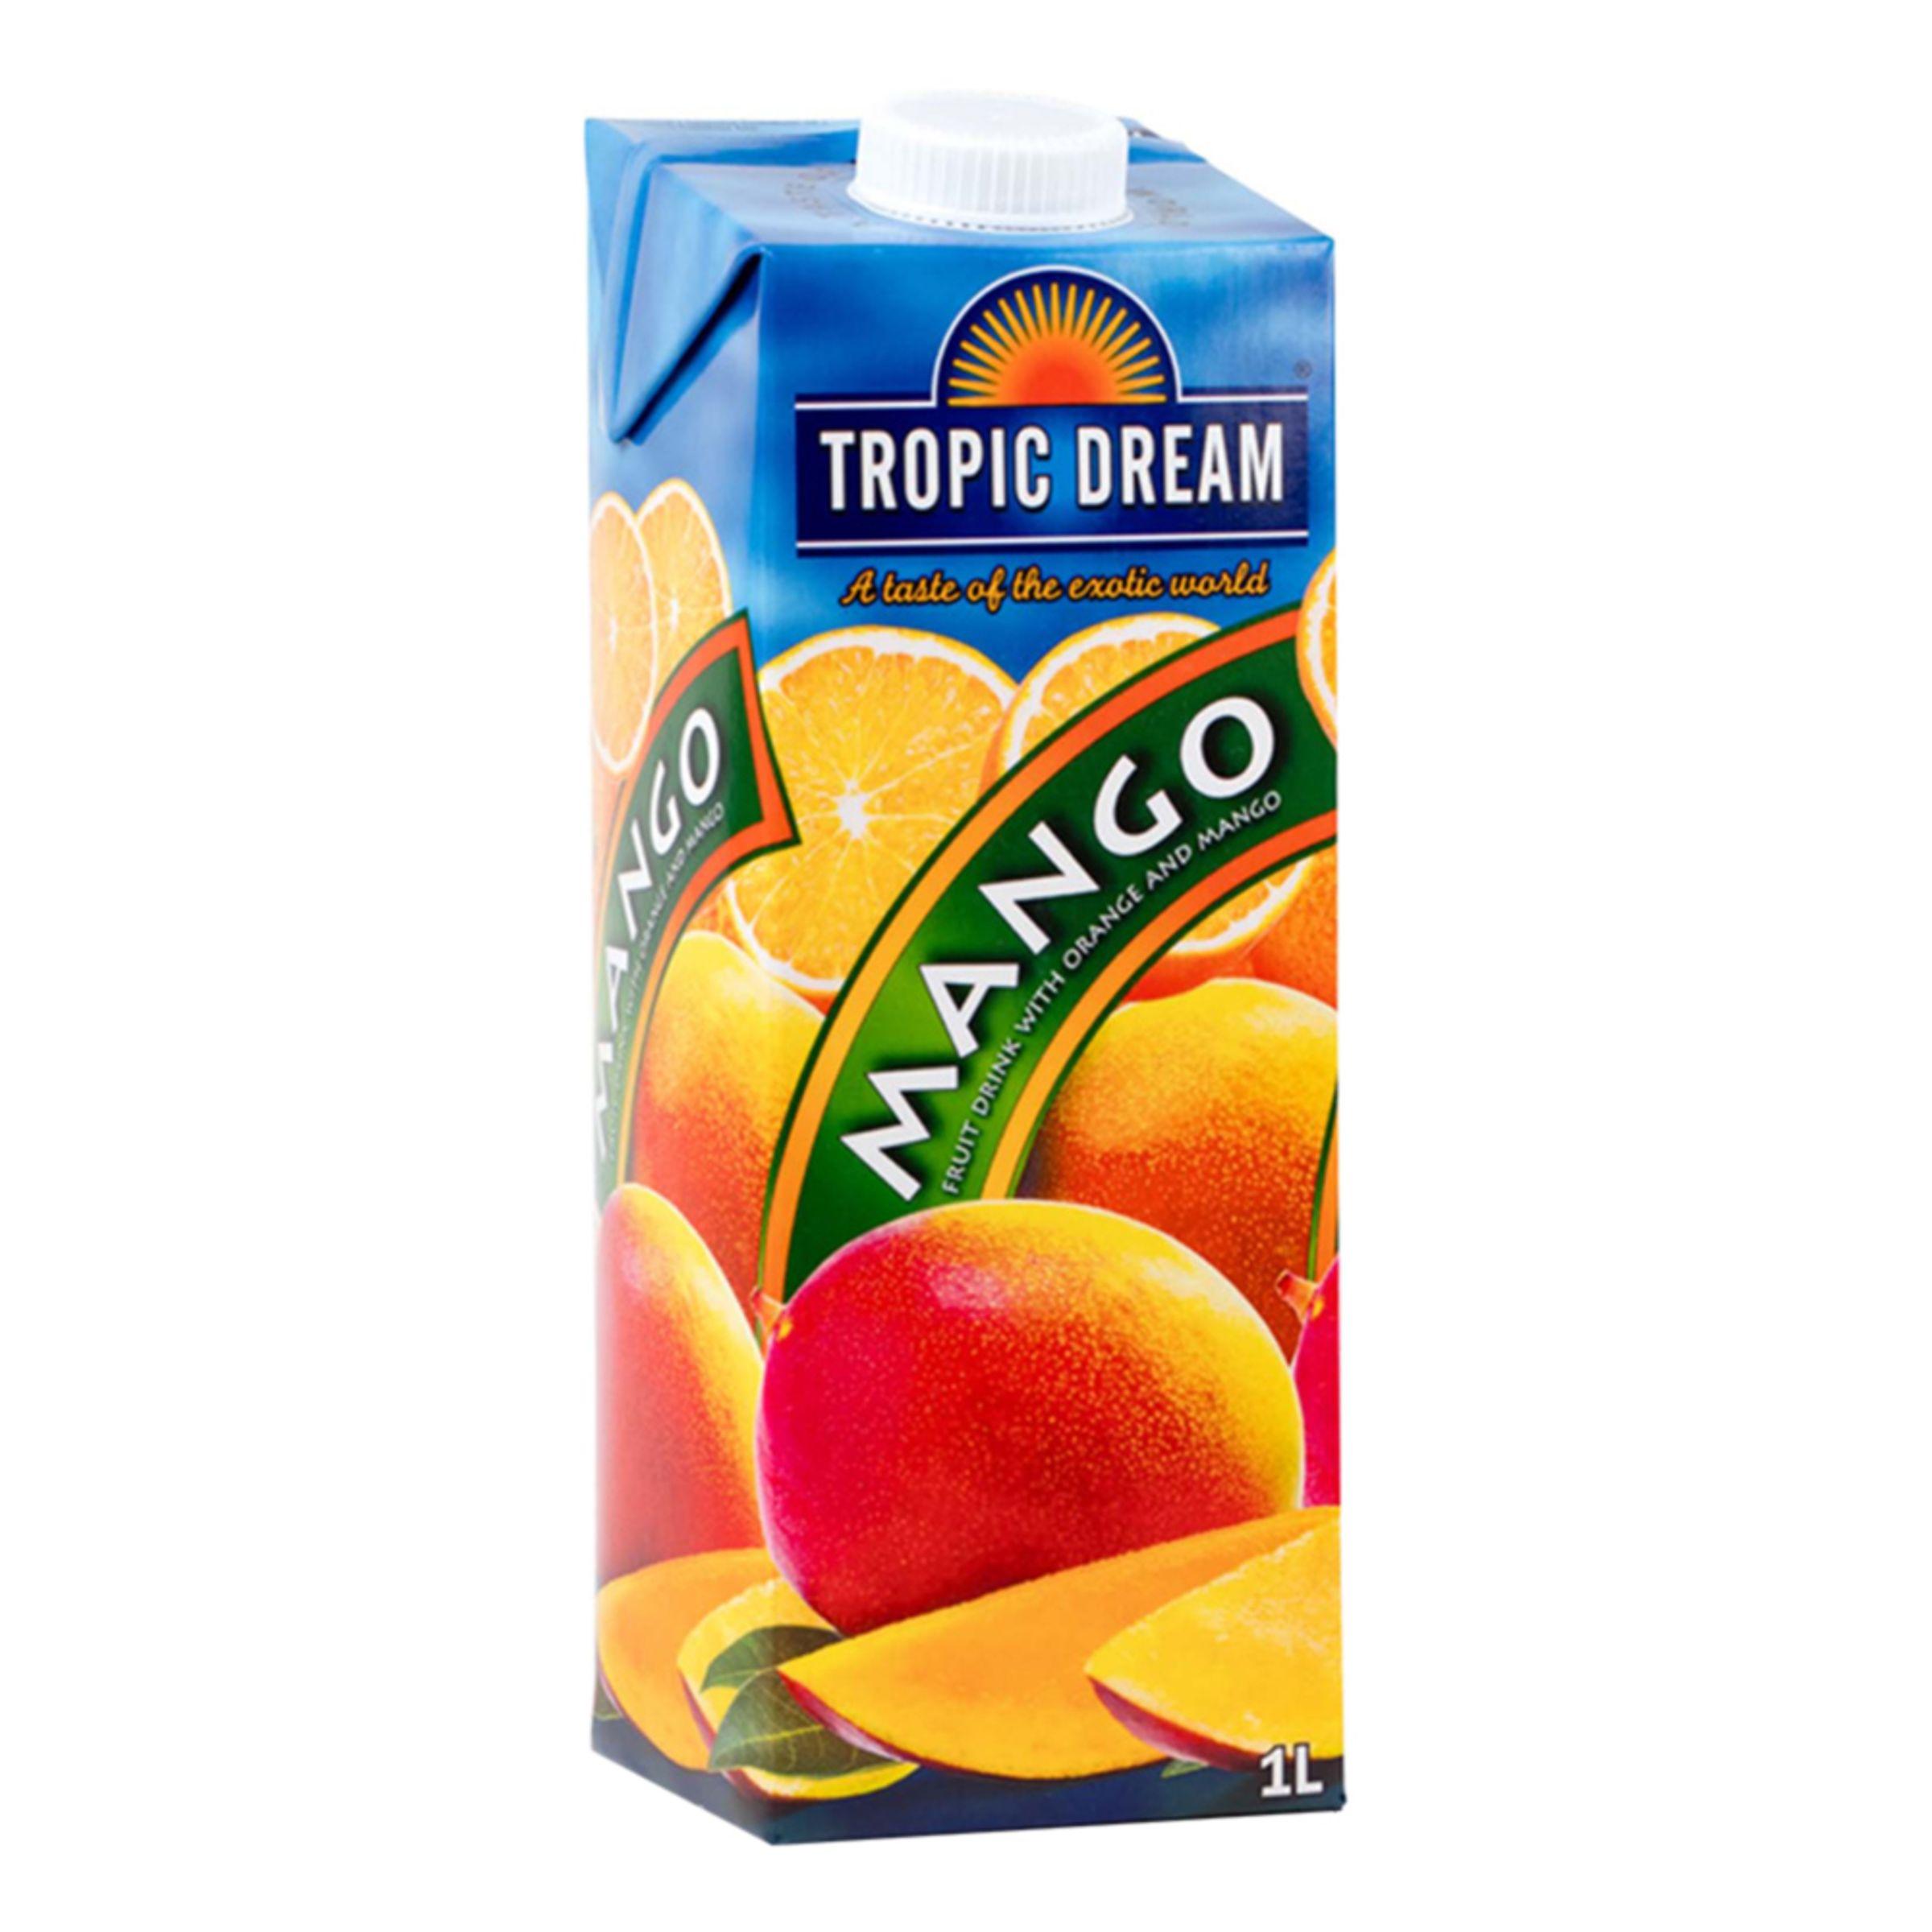 Tropic Dream Mango - 1 liter